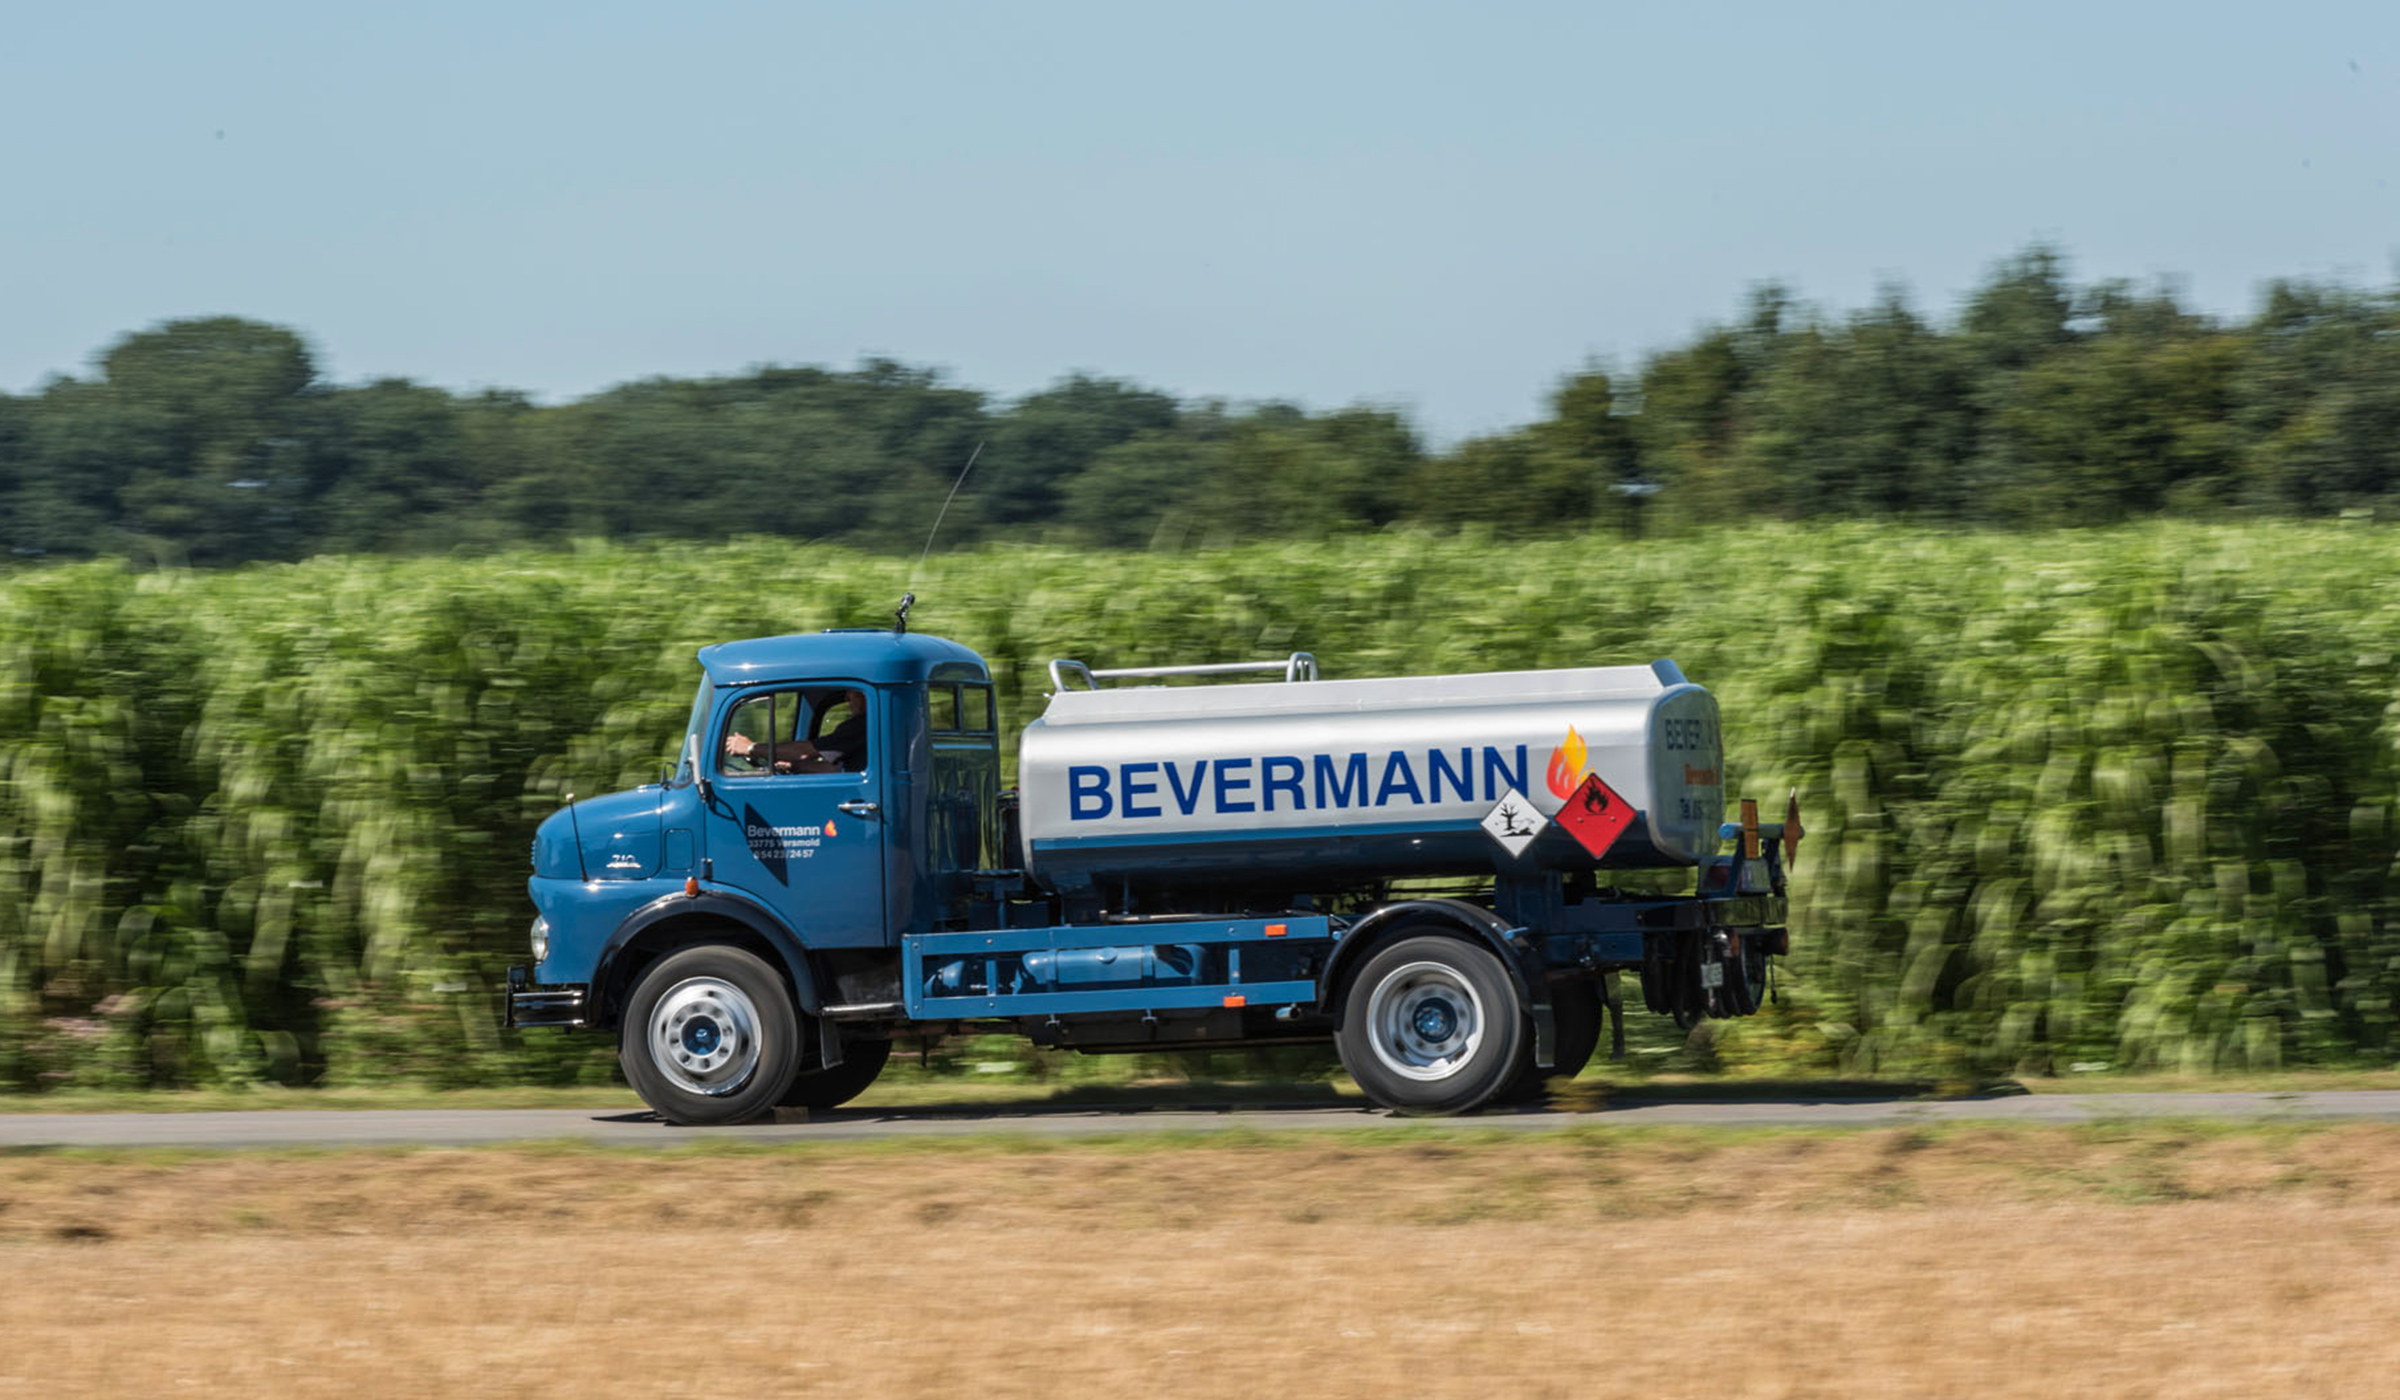 Bevermann Handel historischer Tankwagen